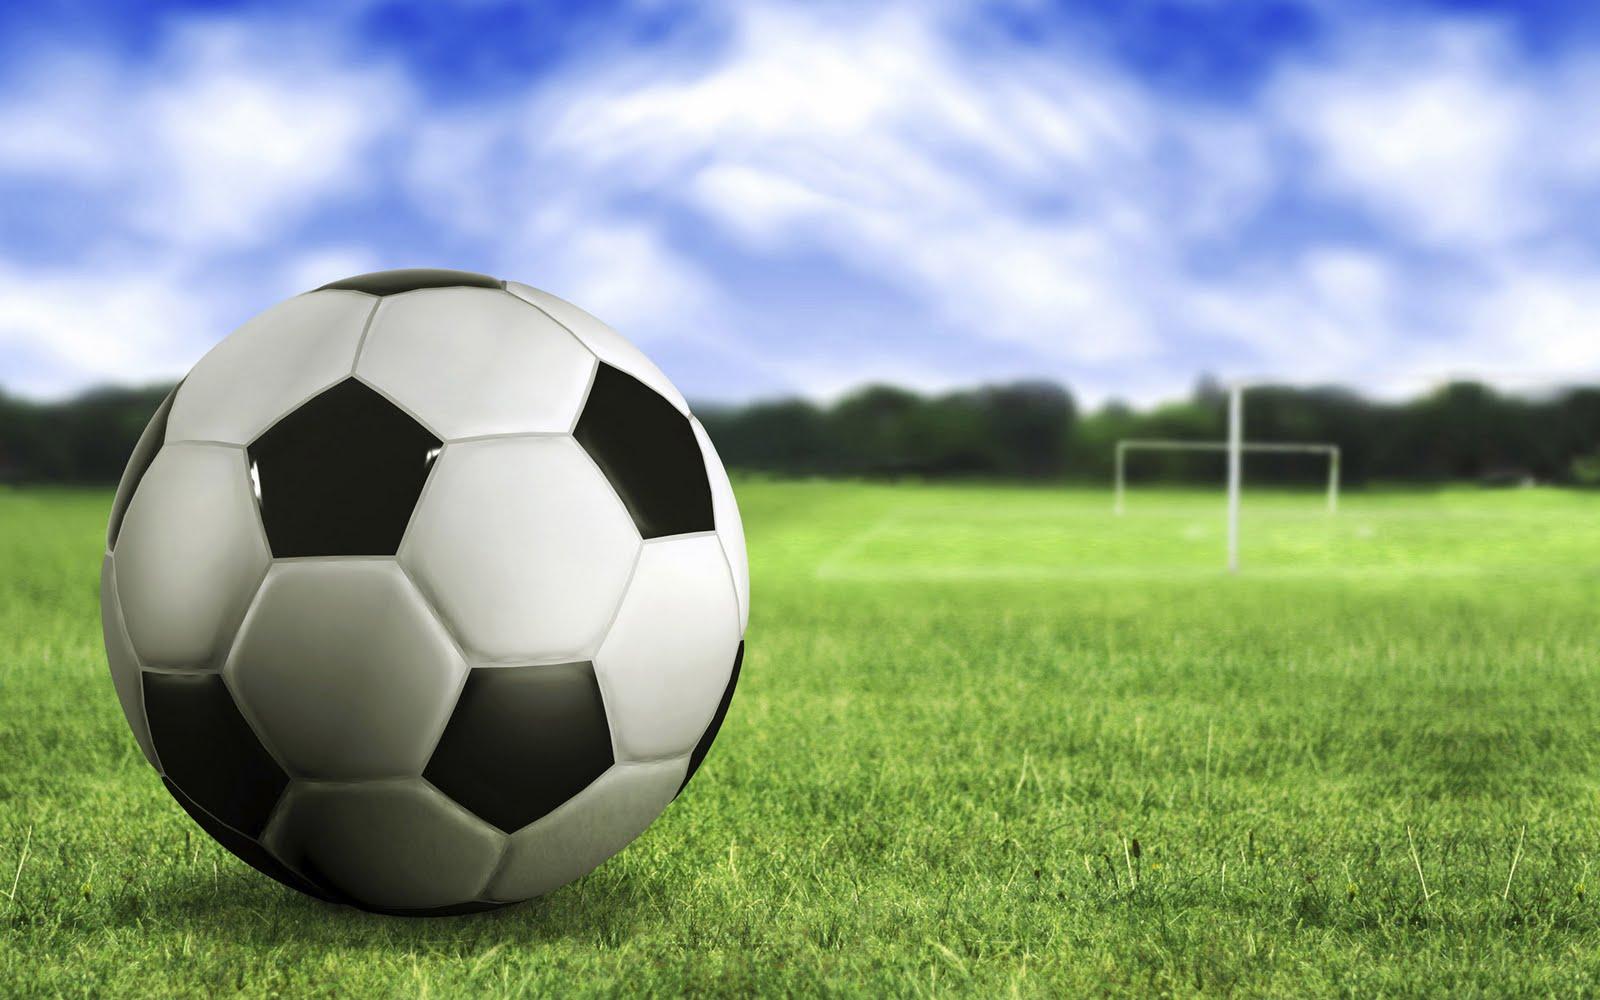 Football Wallpaper HD Football Soccer Wallpaper Pictures 1600x1000